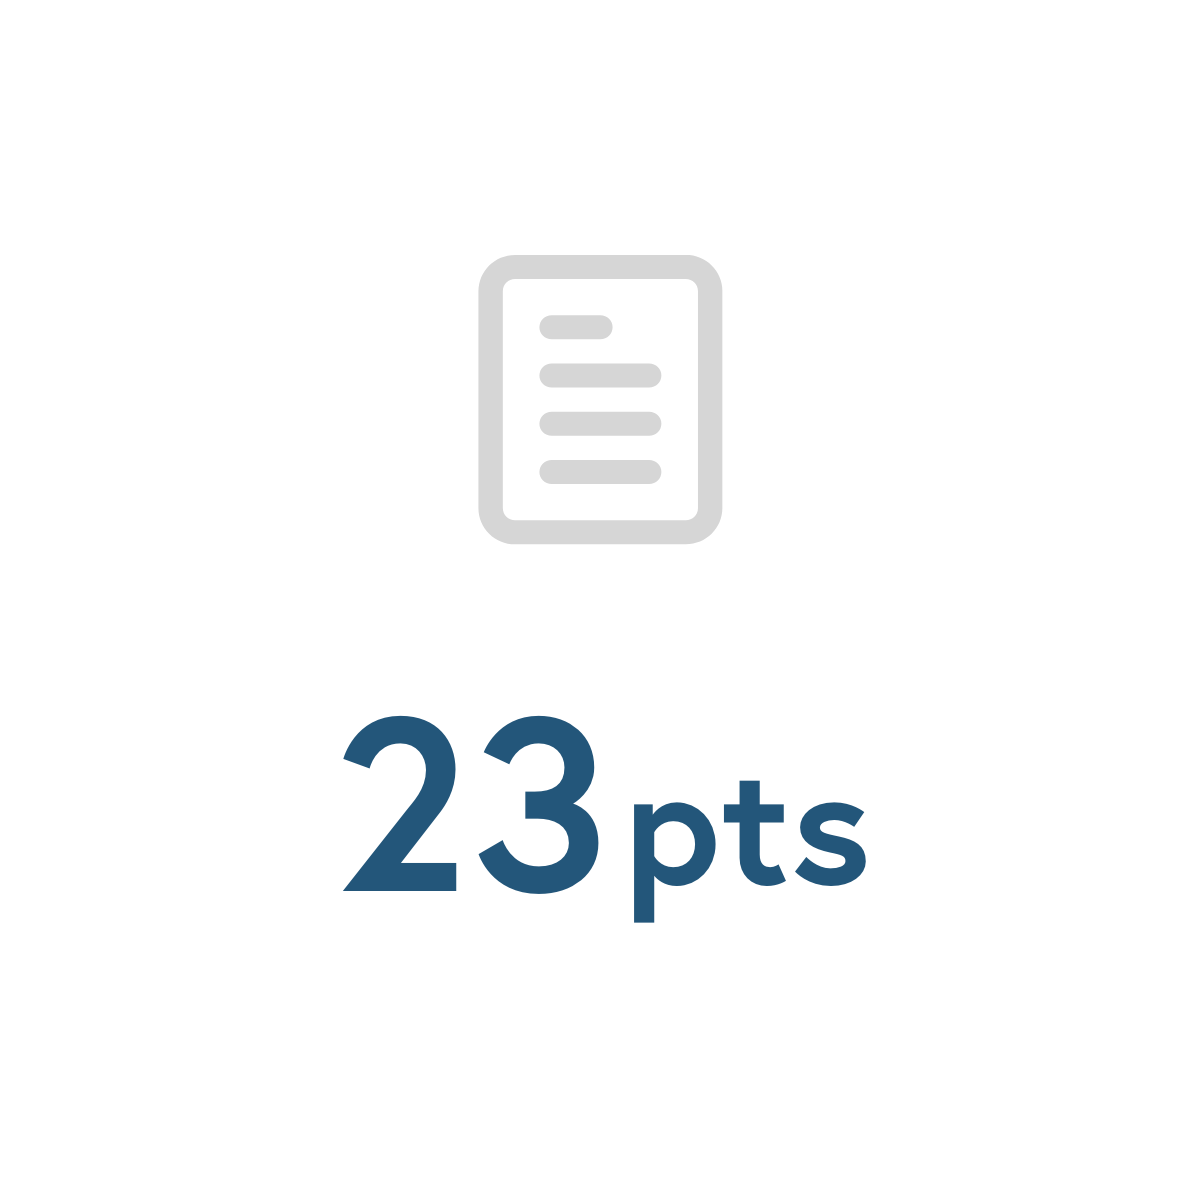 metrics-23-points@2x.png